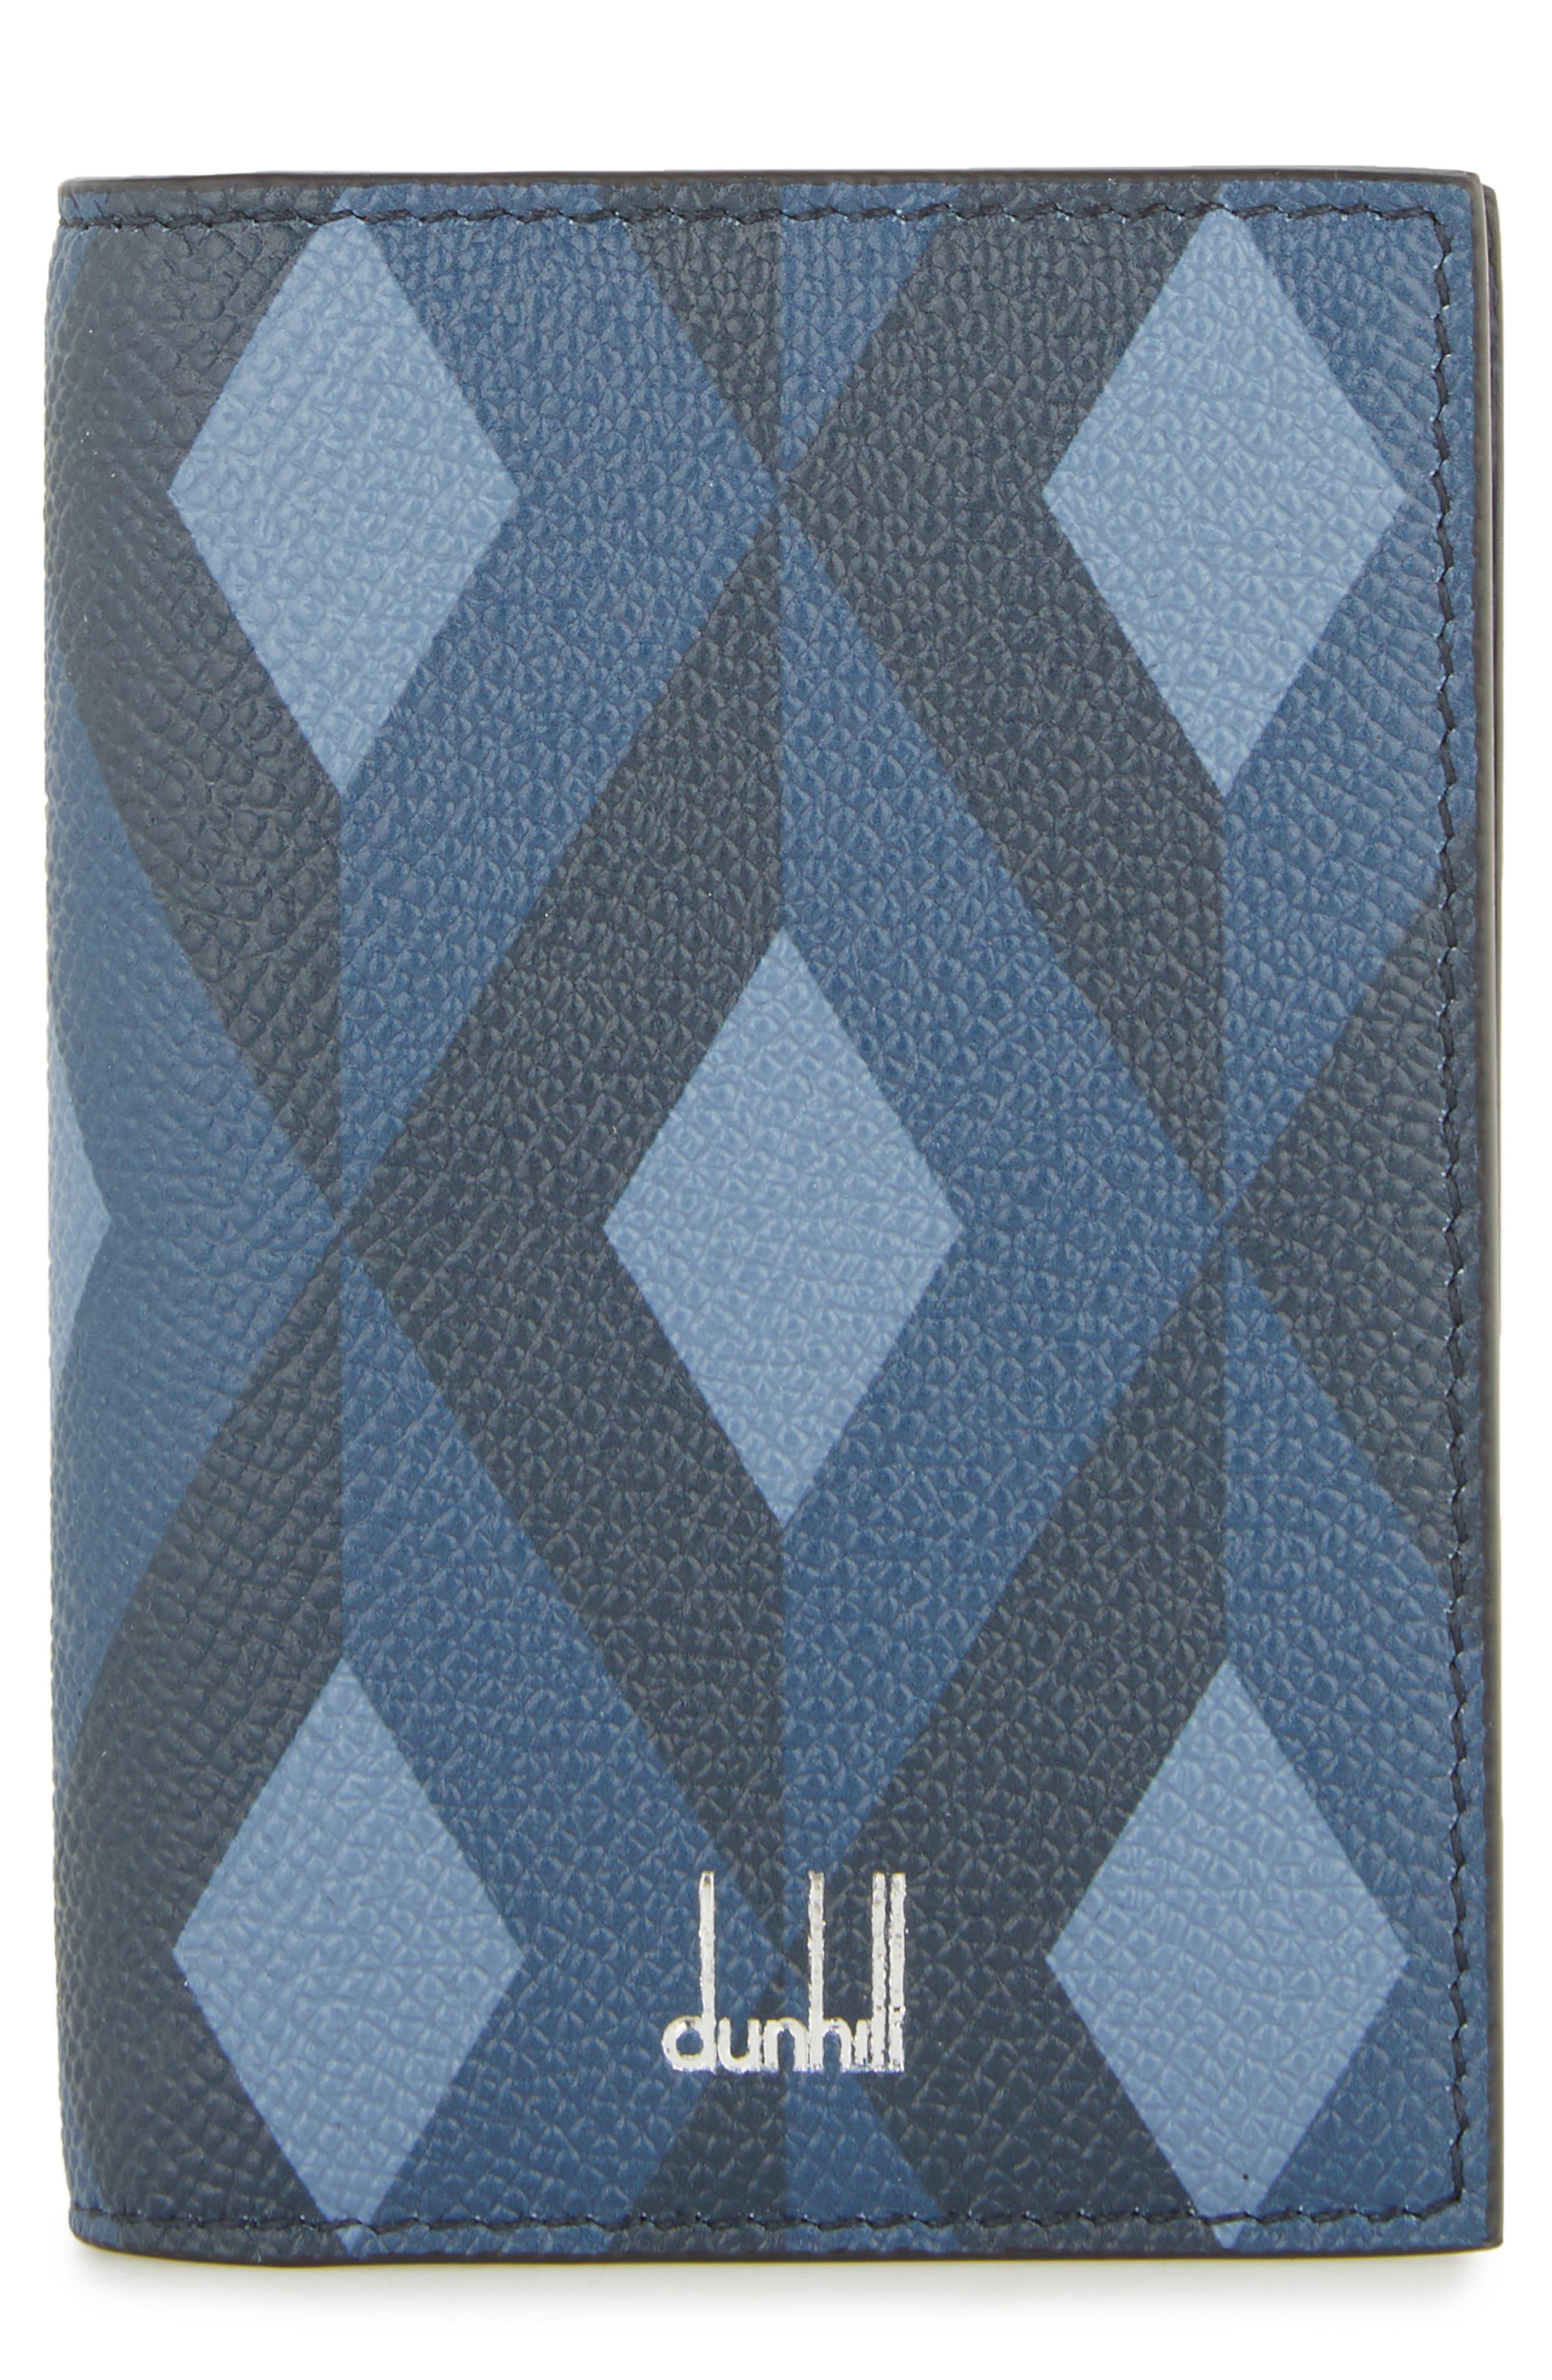 Cadogan Leather Business Card Case,                             Main thumbnail 1, color,                             BLUE